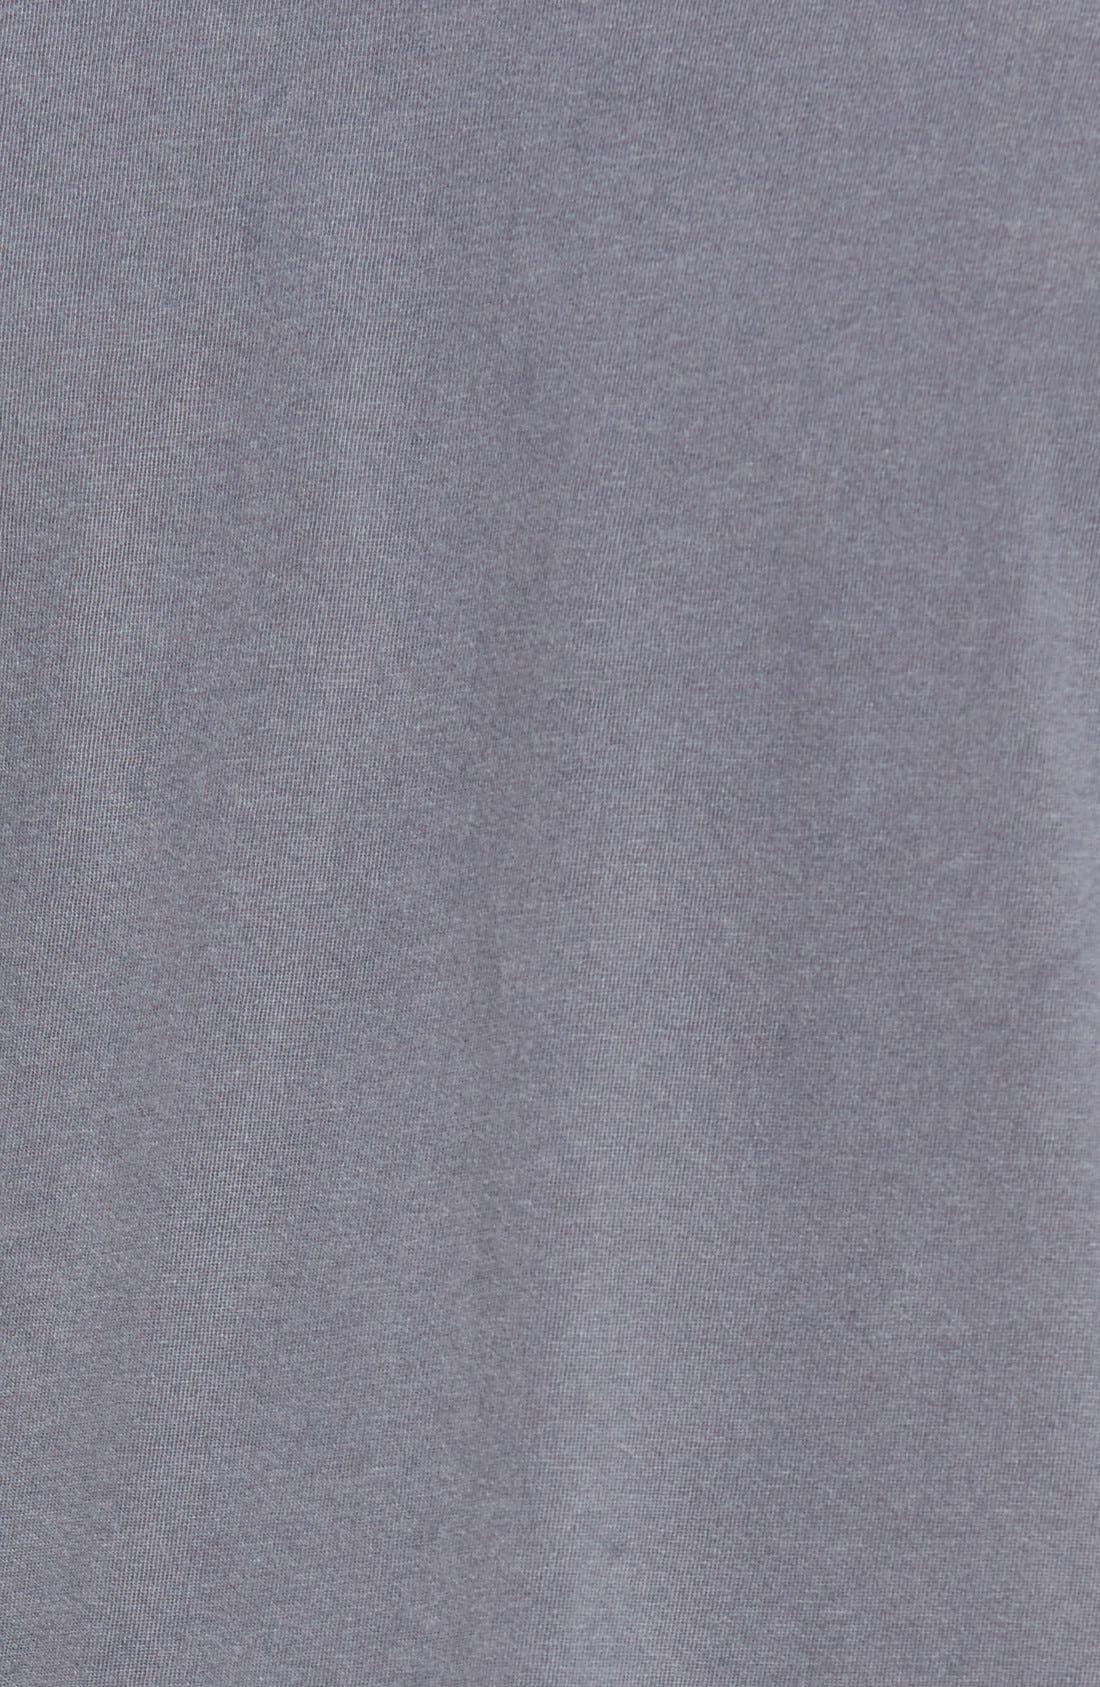 Flintlock Longline T-Shirt,                             Alternate thumbnail 9, color,                             029